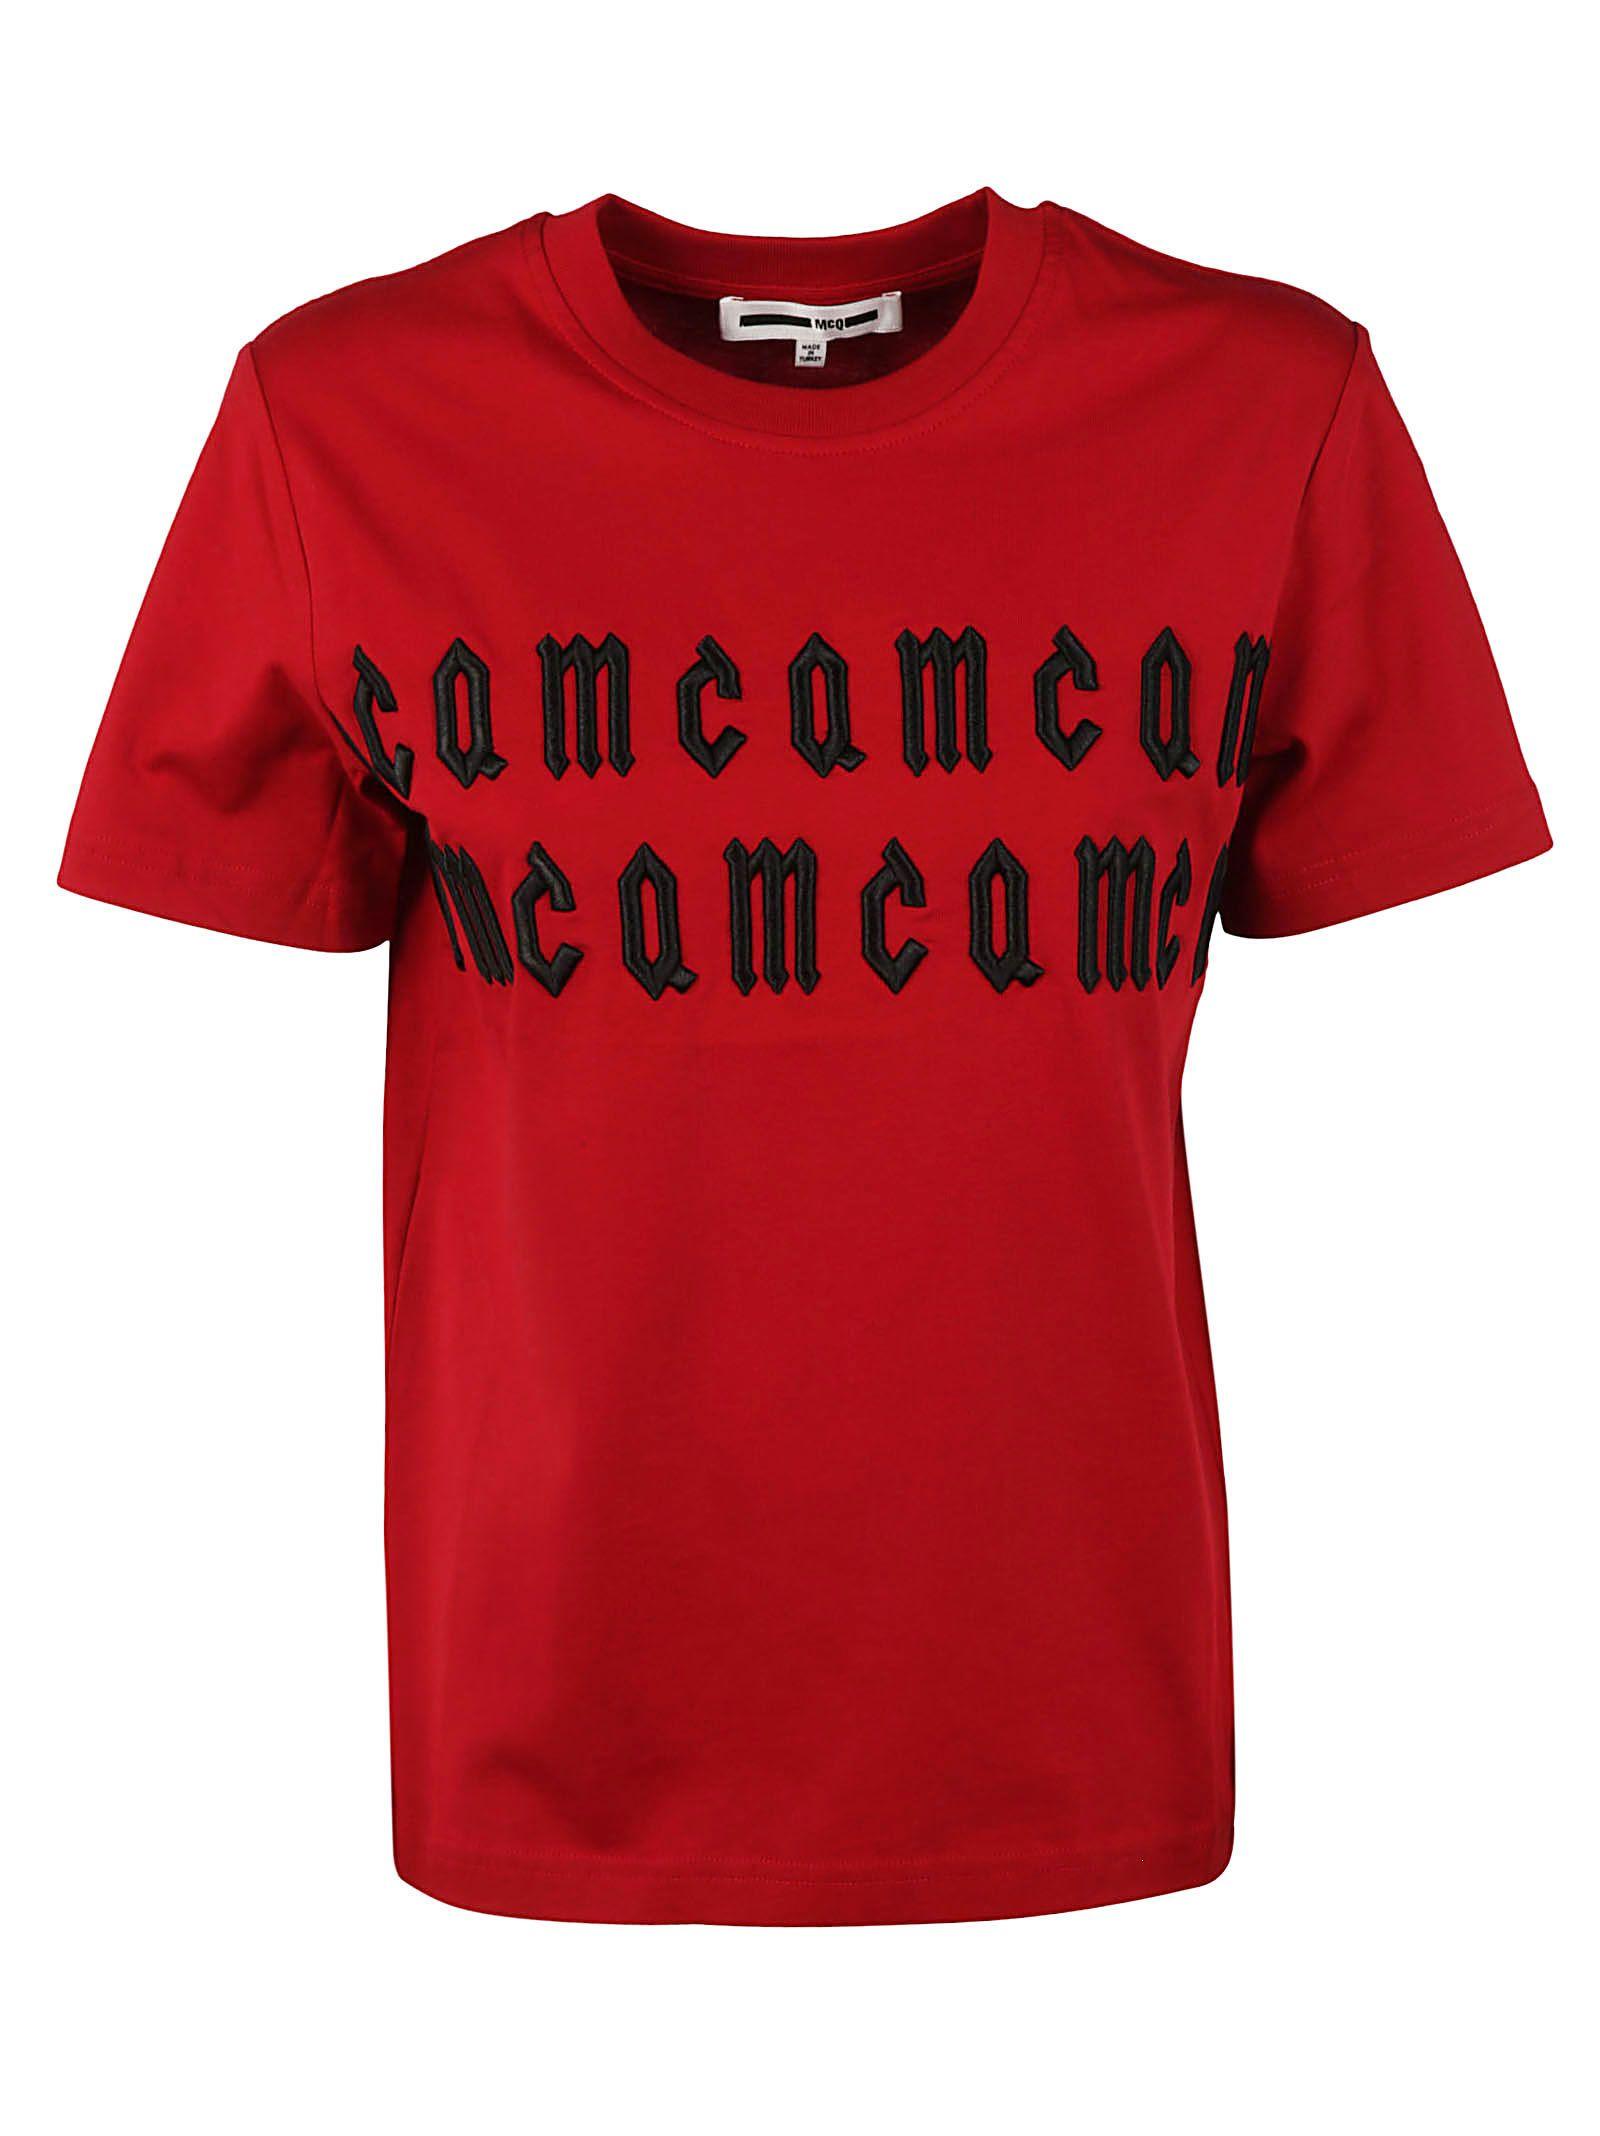 Mcq Alexander Mcqueen Embroidered T-shirt